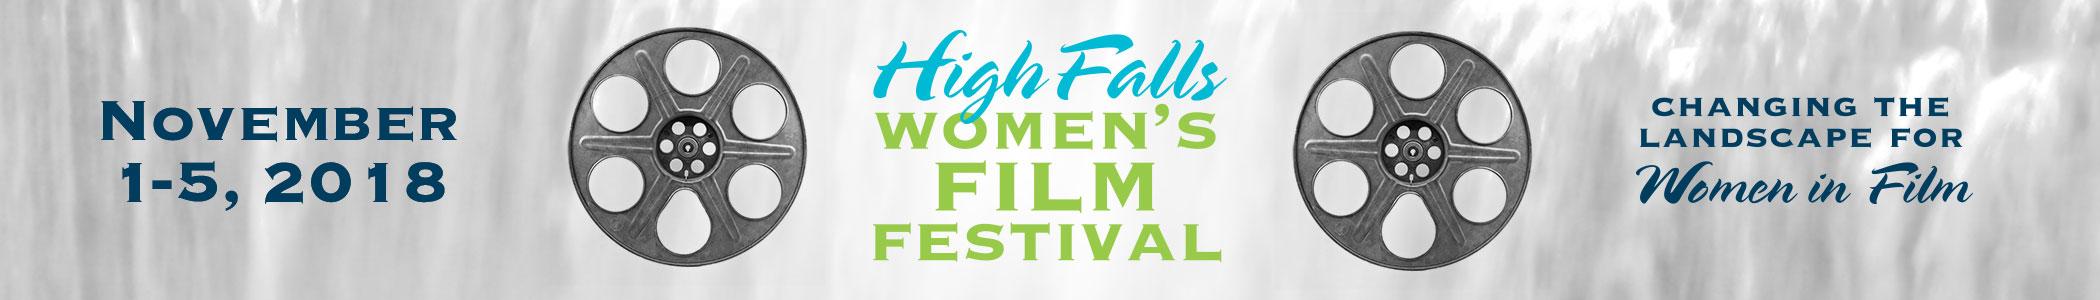 2018 High Falls Film Festival